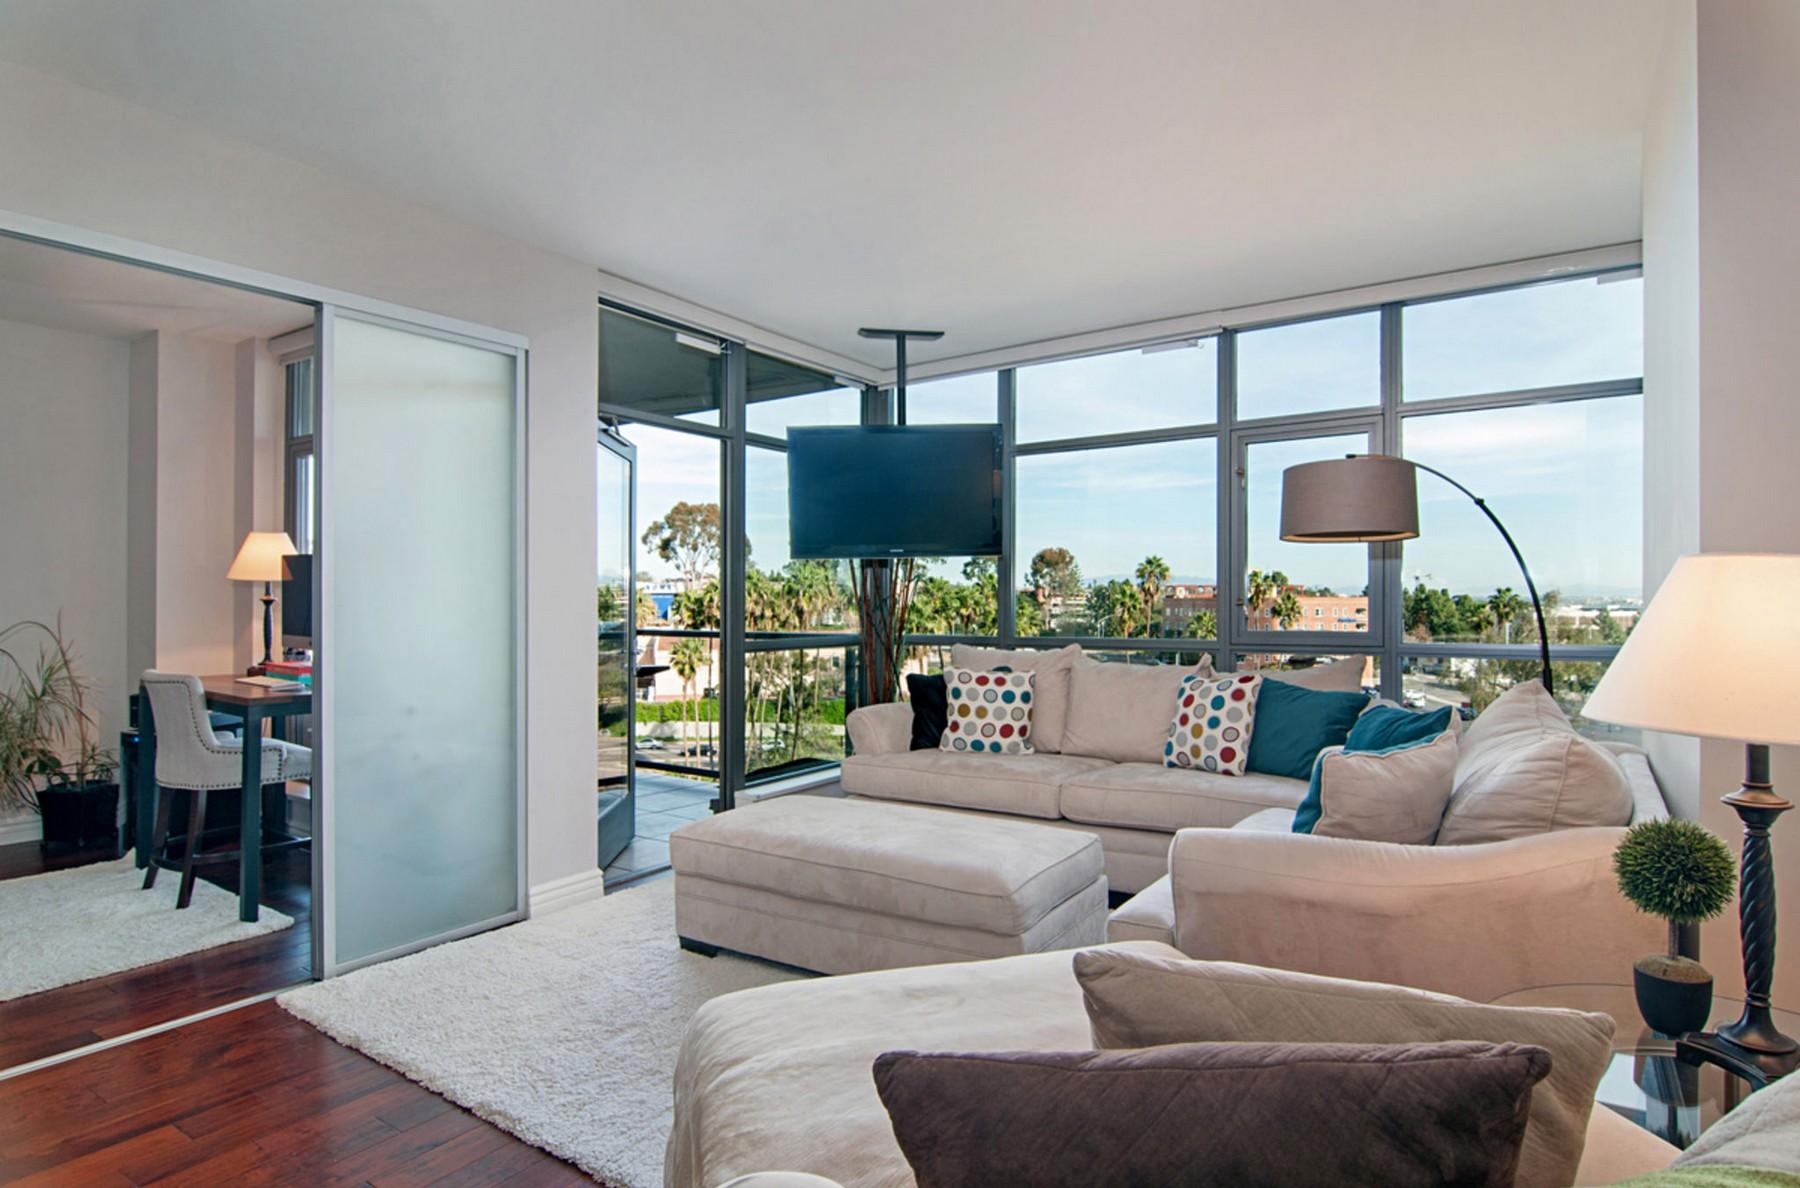 Nhà chung cư vì Bán tại 1441 9th Avenue #505 San Diego, California, 92101 Hoa Kỳ